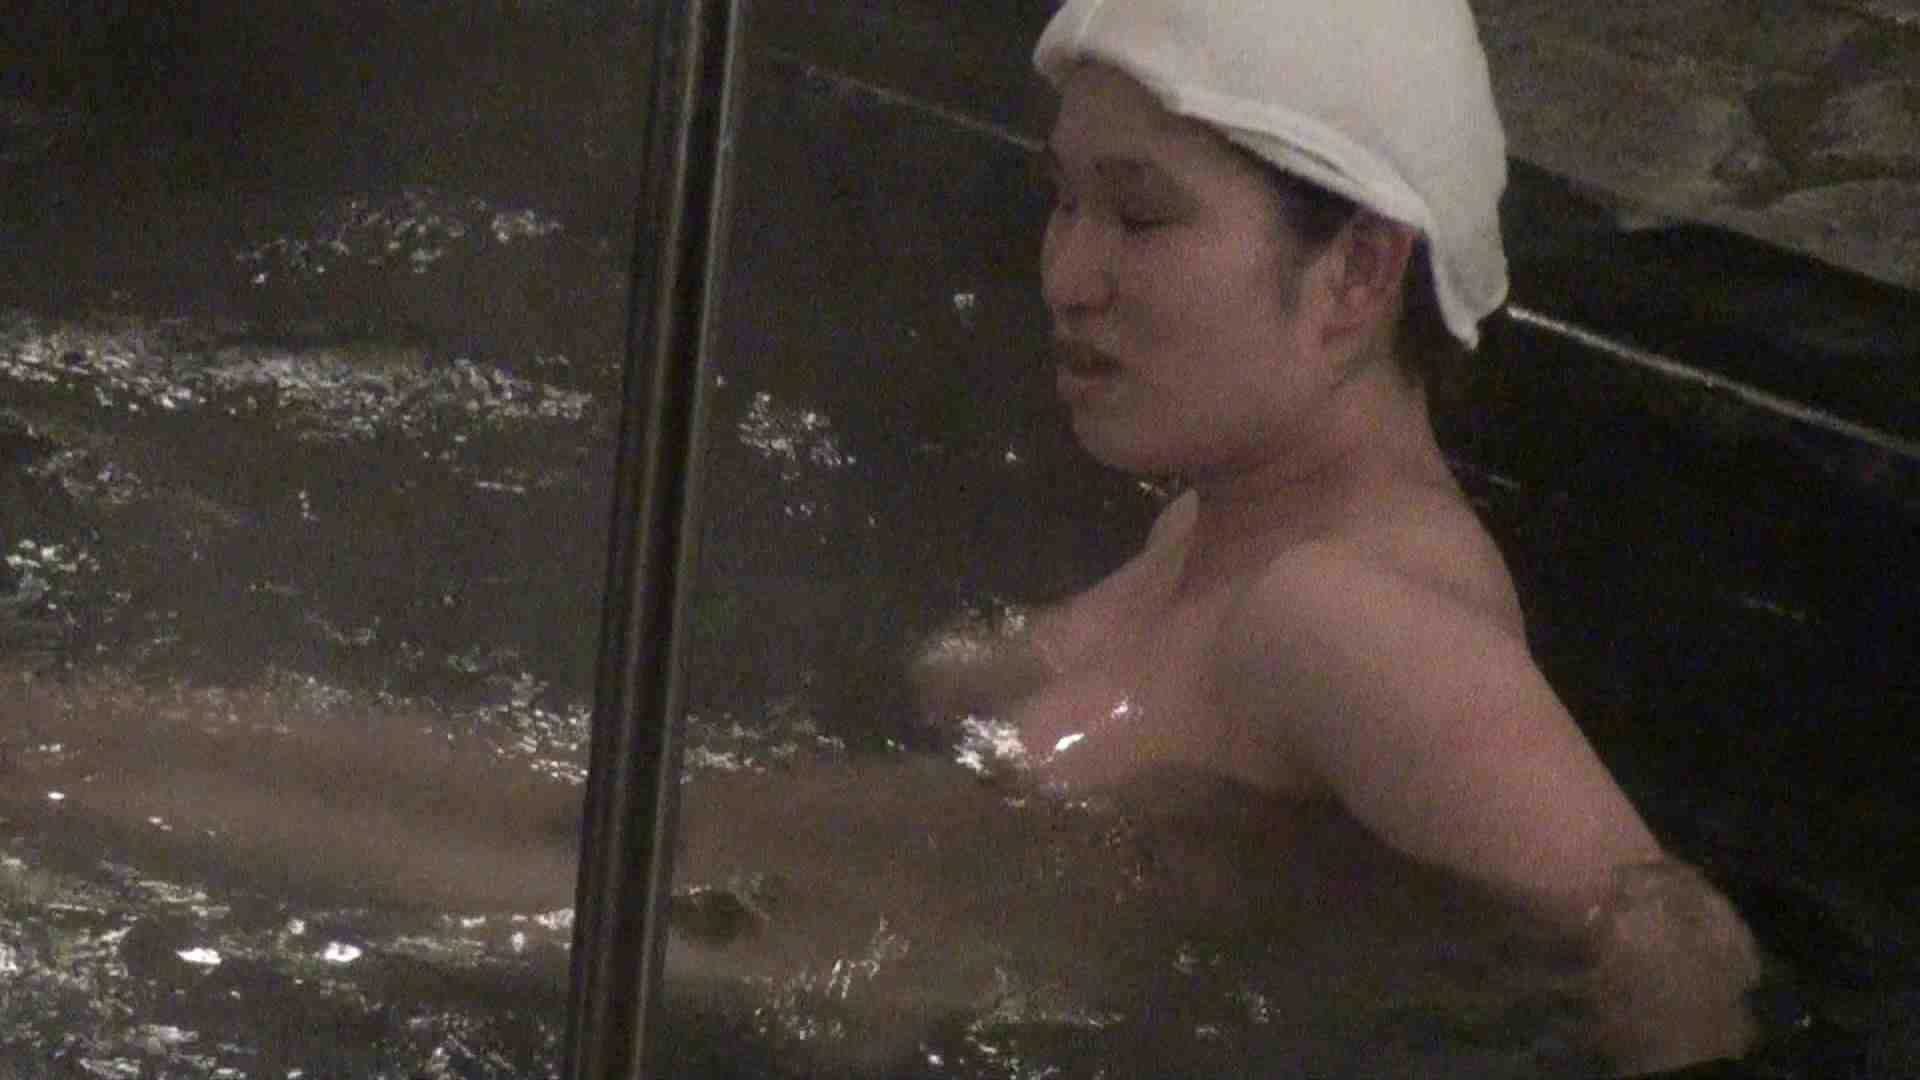 Aquaな露天風呂Vol.331 女体盗撮 | OL女体  53連発 13